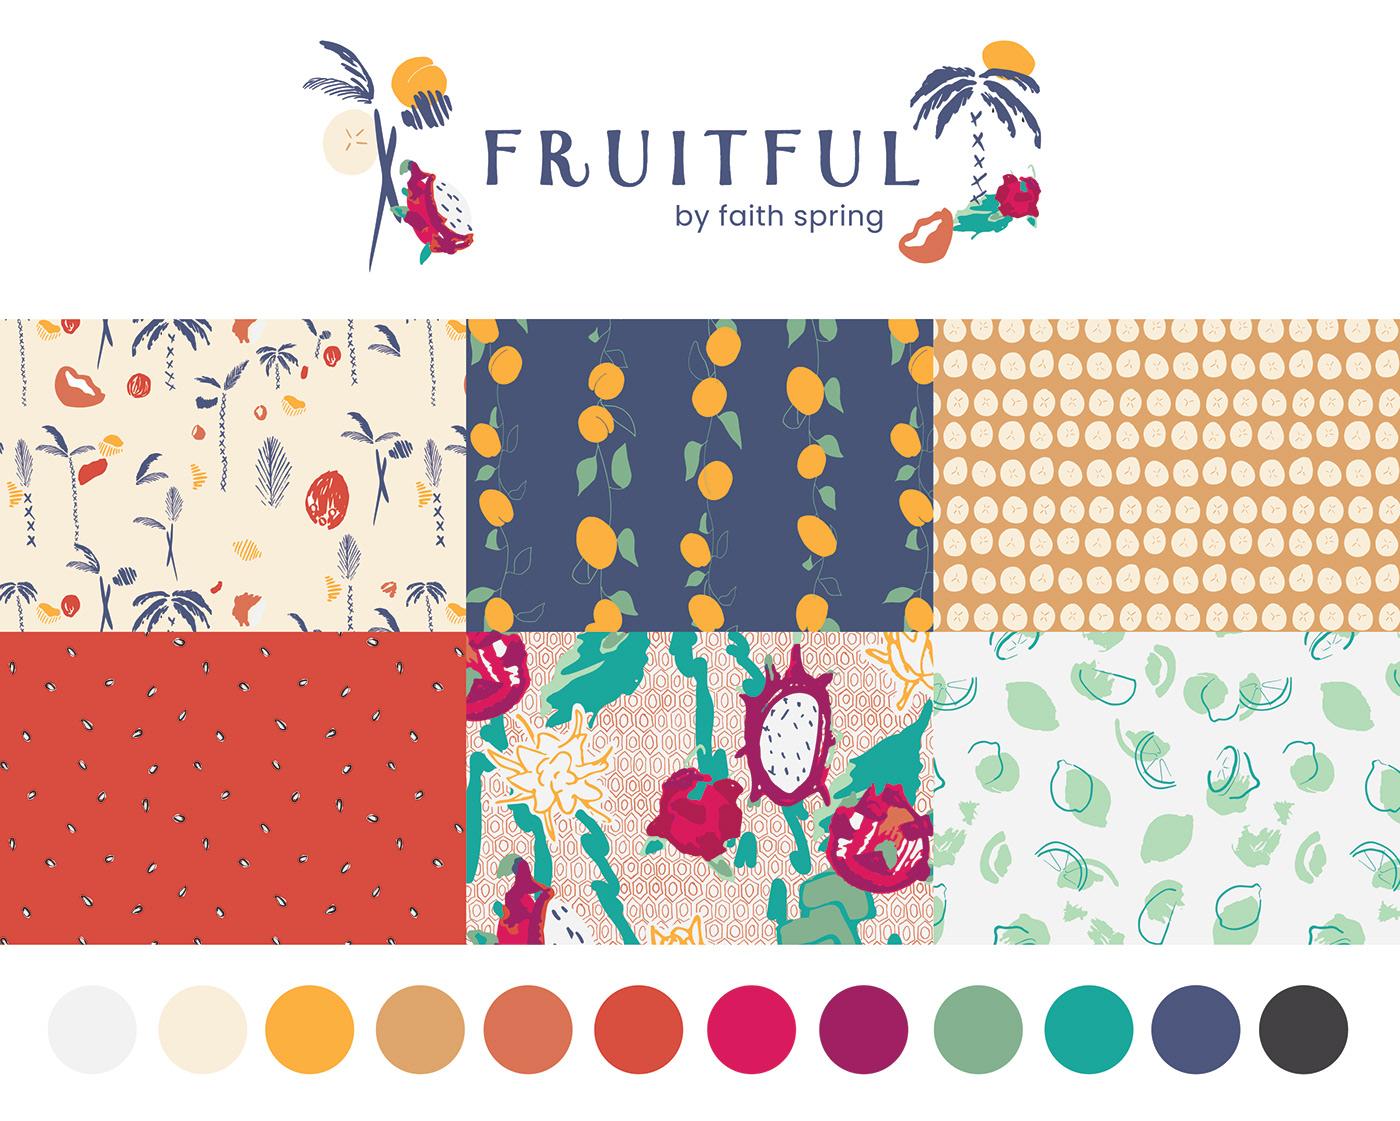 fabric design Fruit Illustration fruit prints graphic design  pattern design  print design  surface design surface pattern design textile design  Wallpaper design